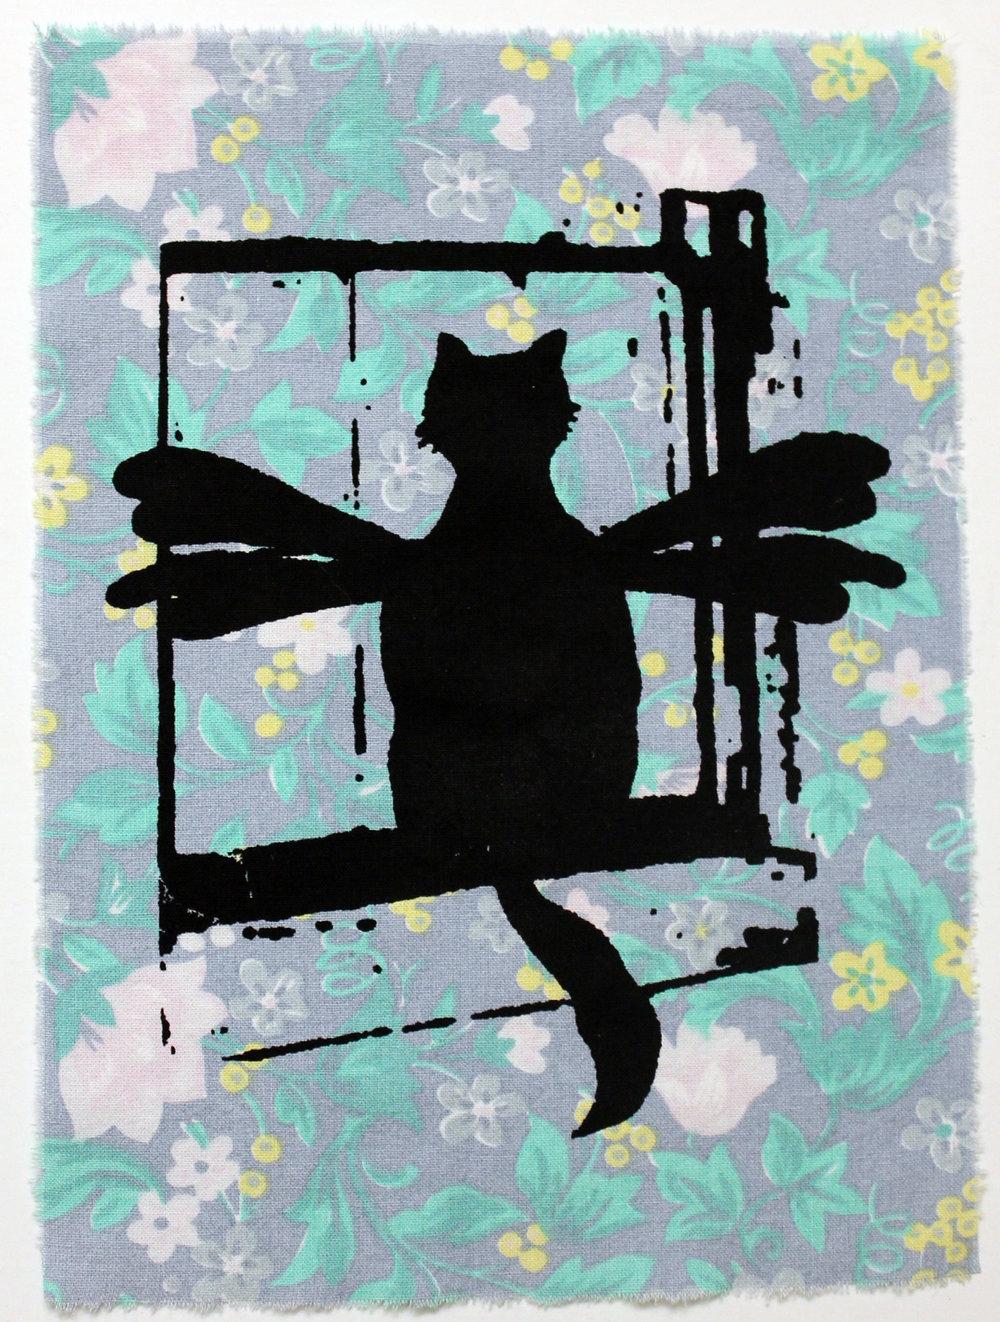 catwingsbluevintage.jpg